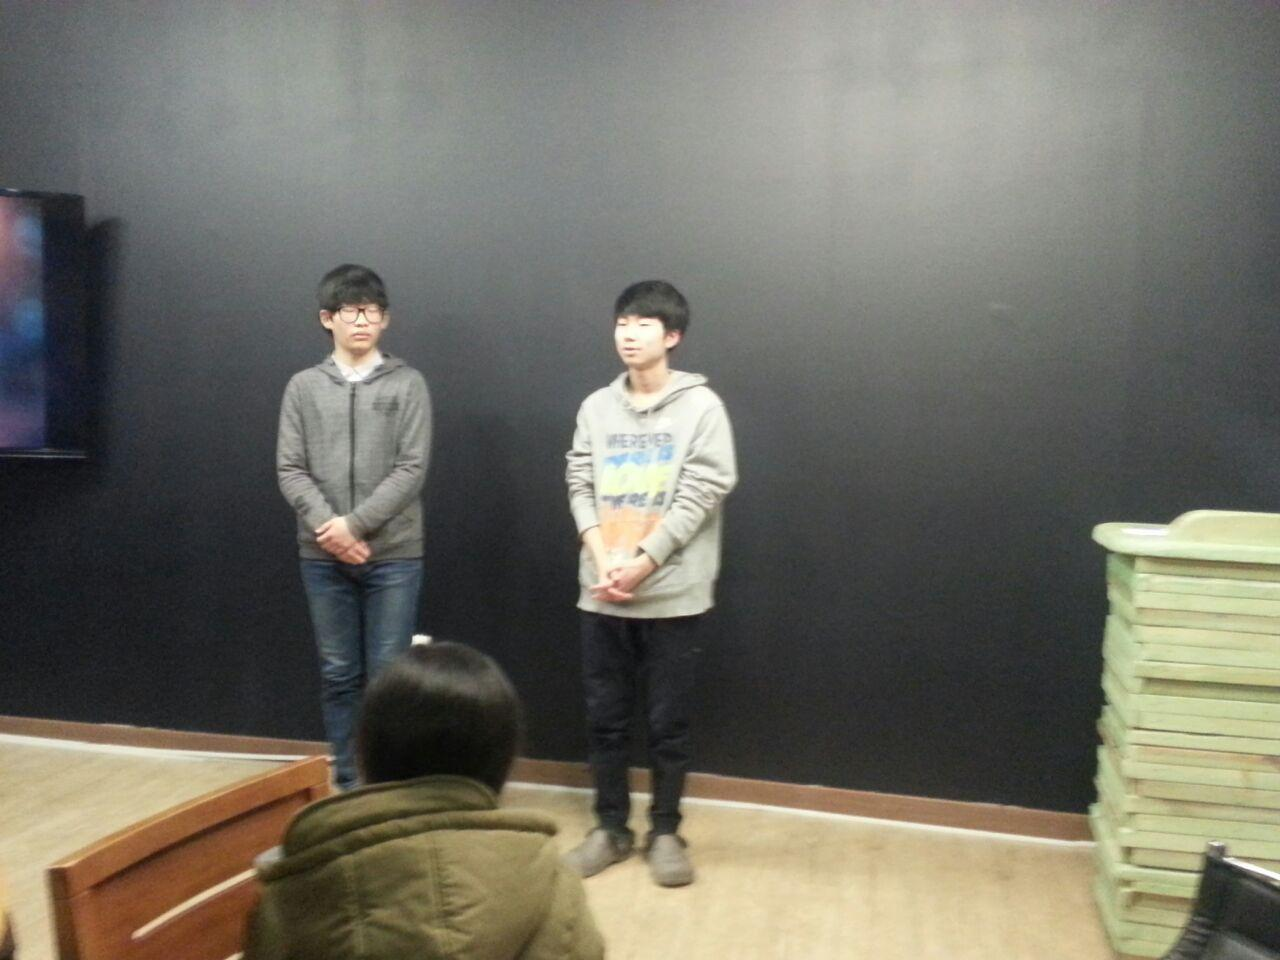 photo_2017-02-15_19-58-07.jpg